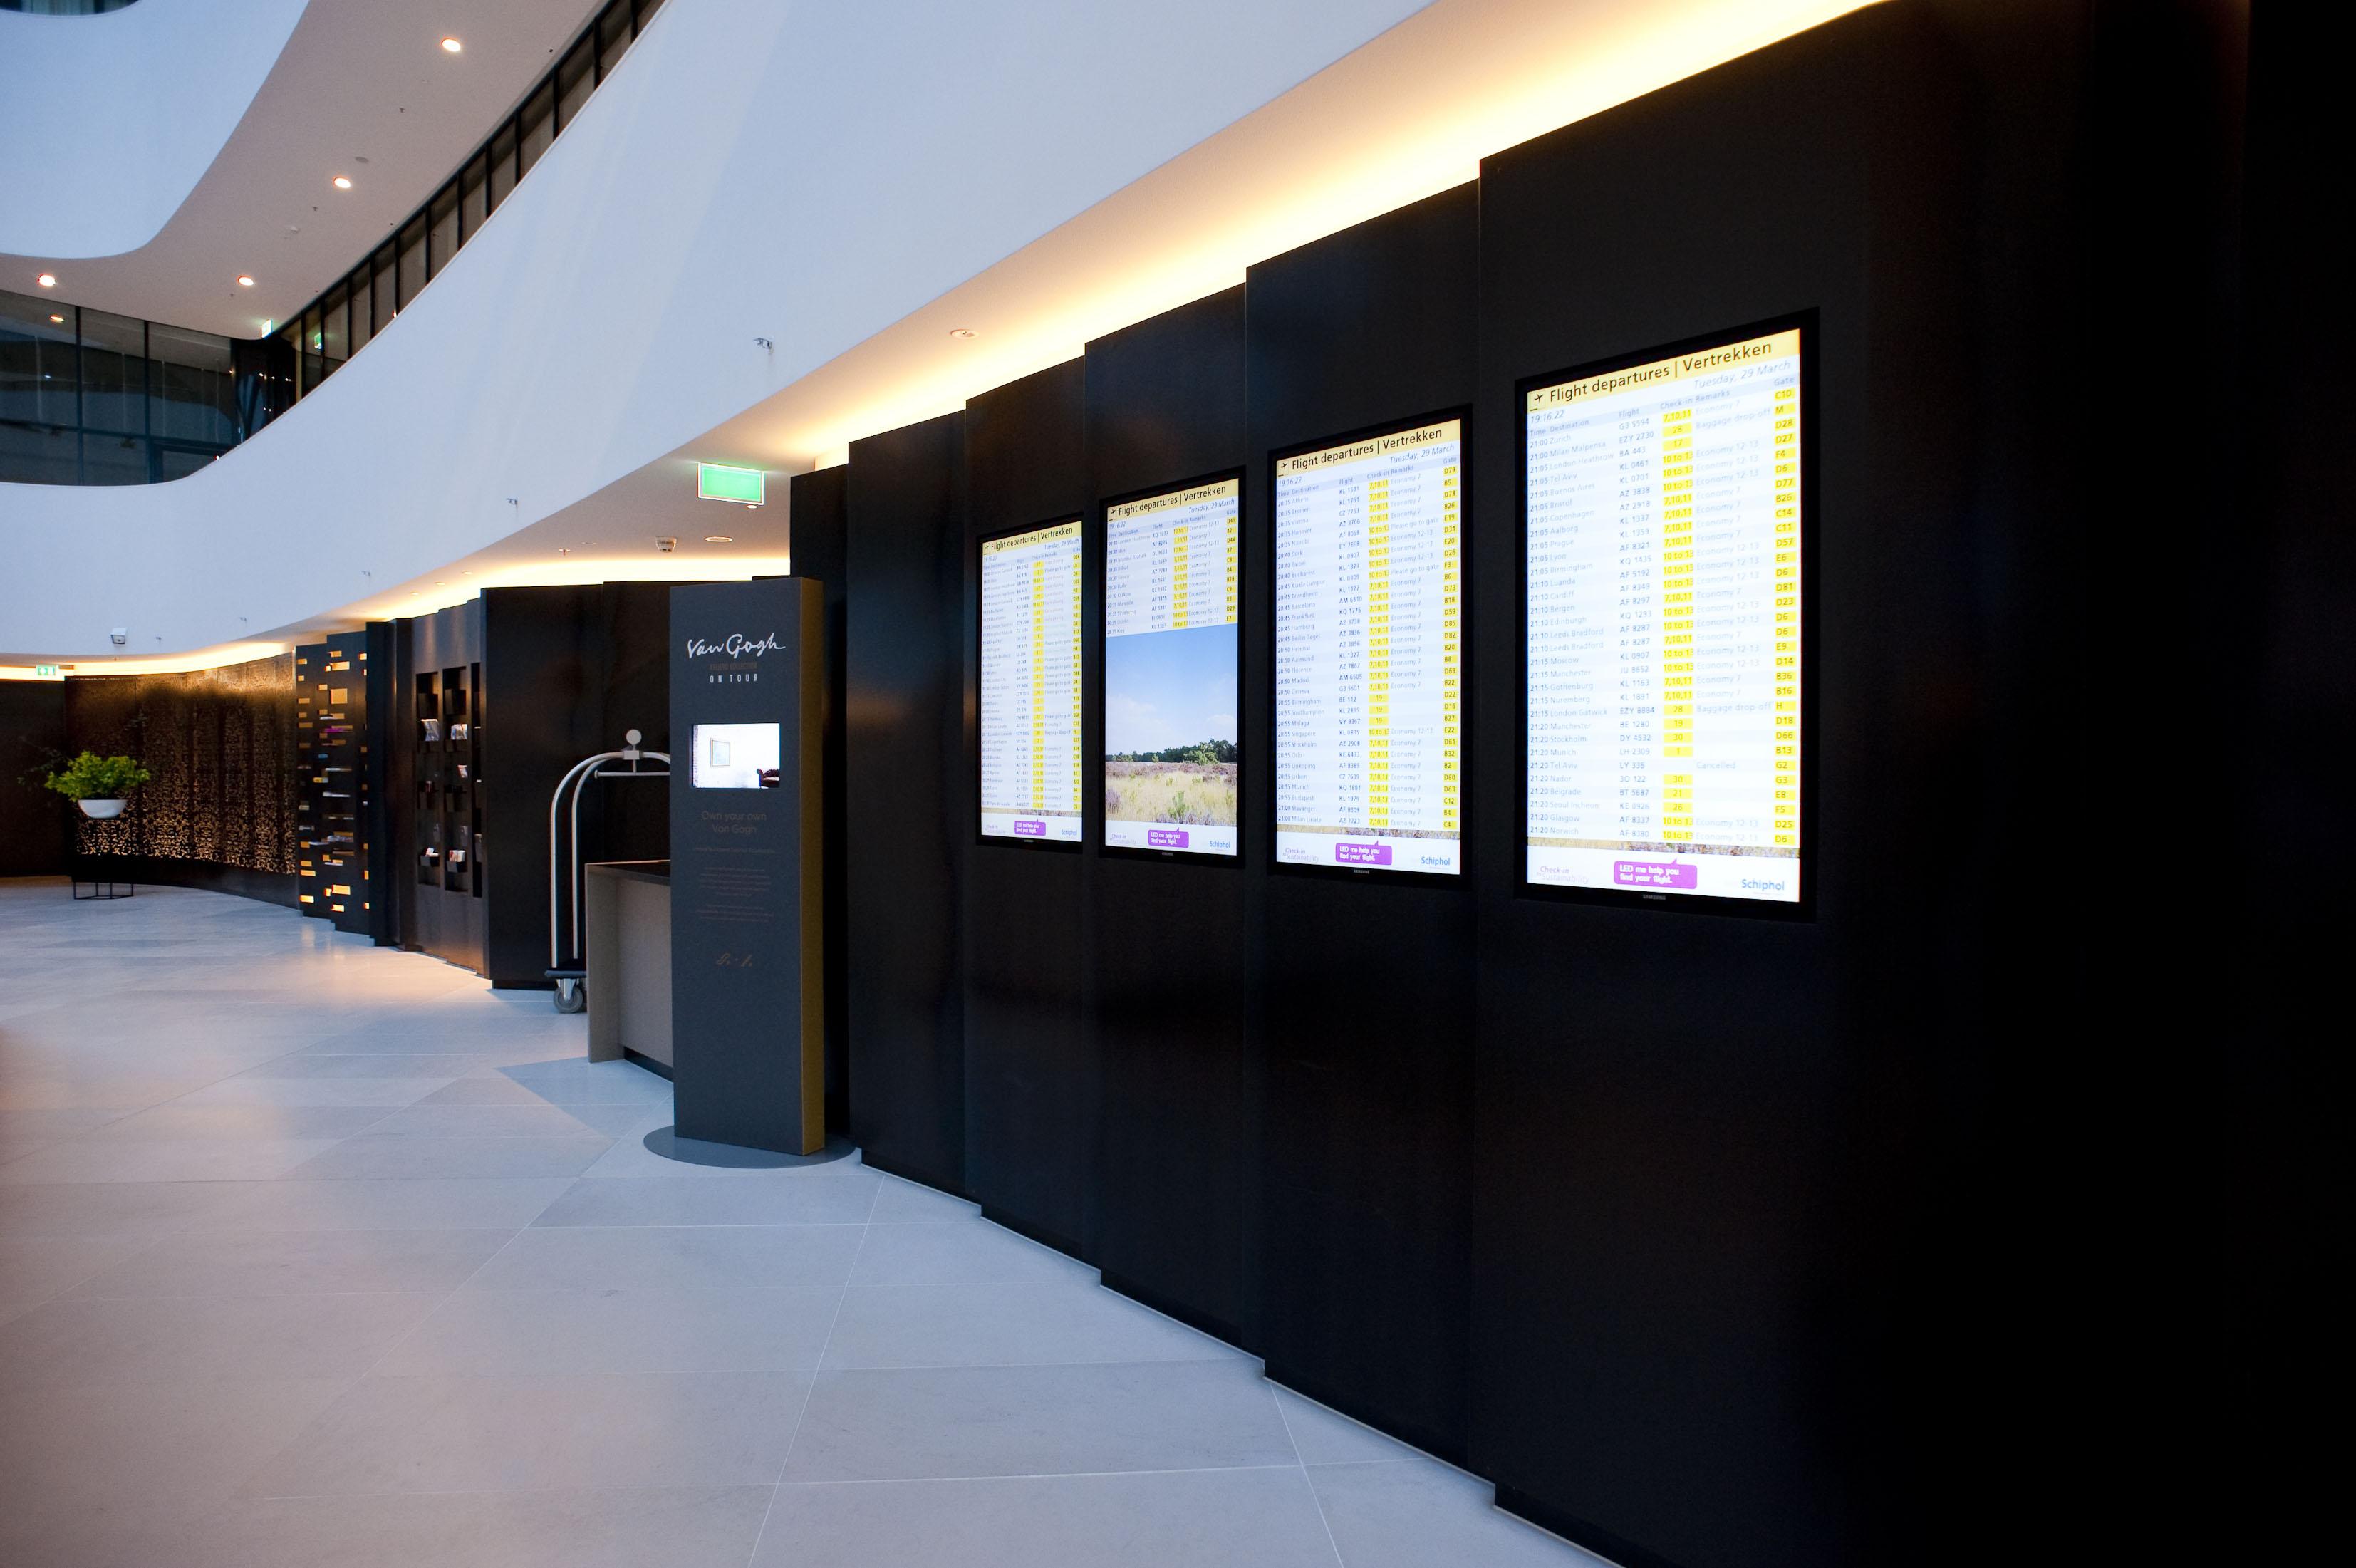 Hilton Airport Schiphol Lobby